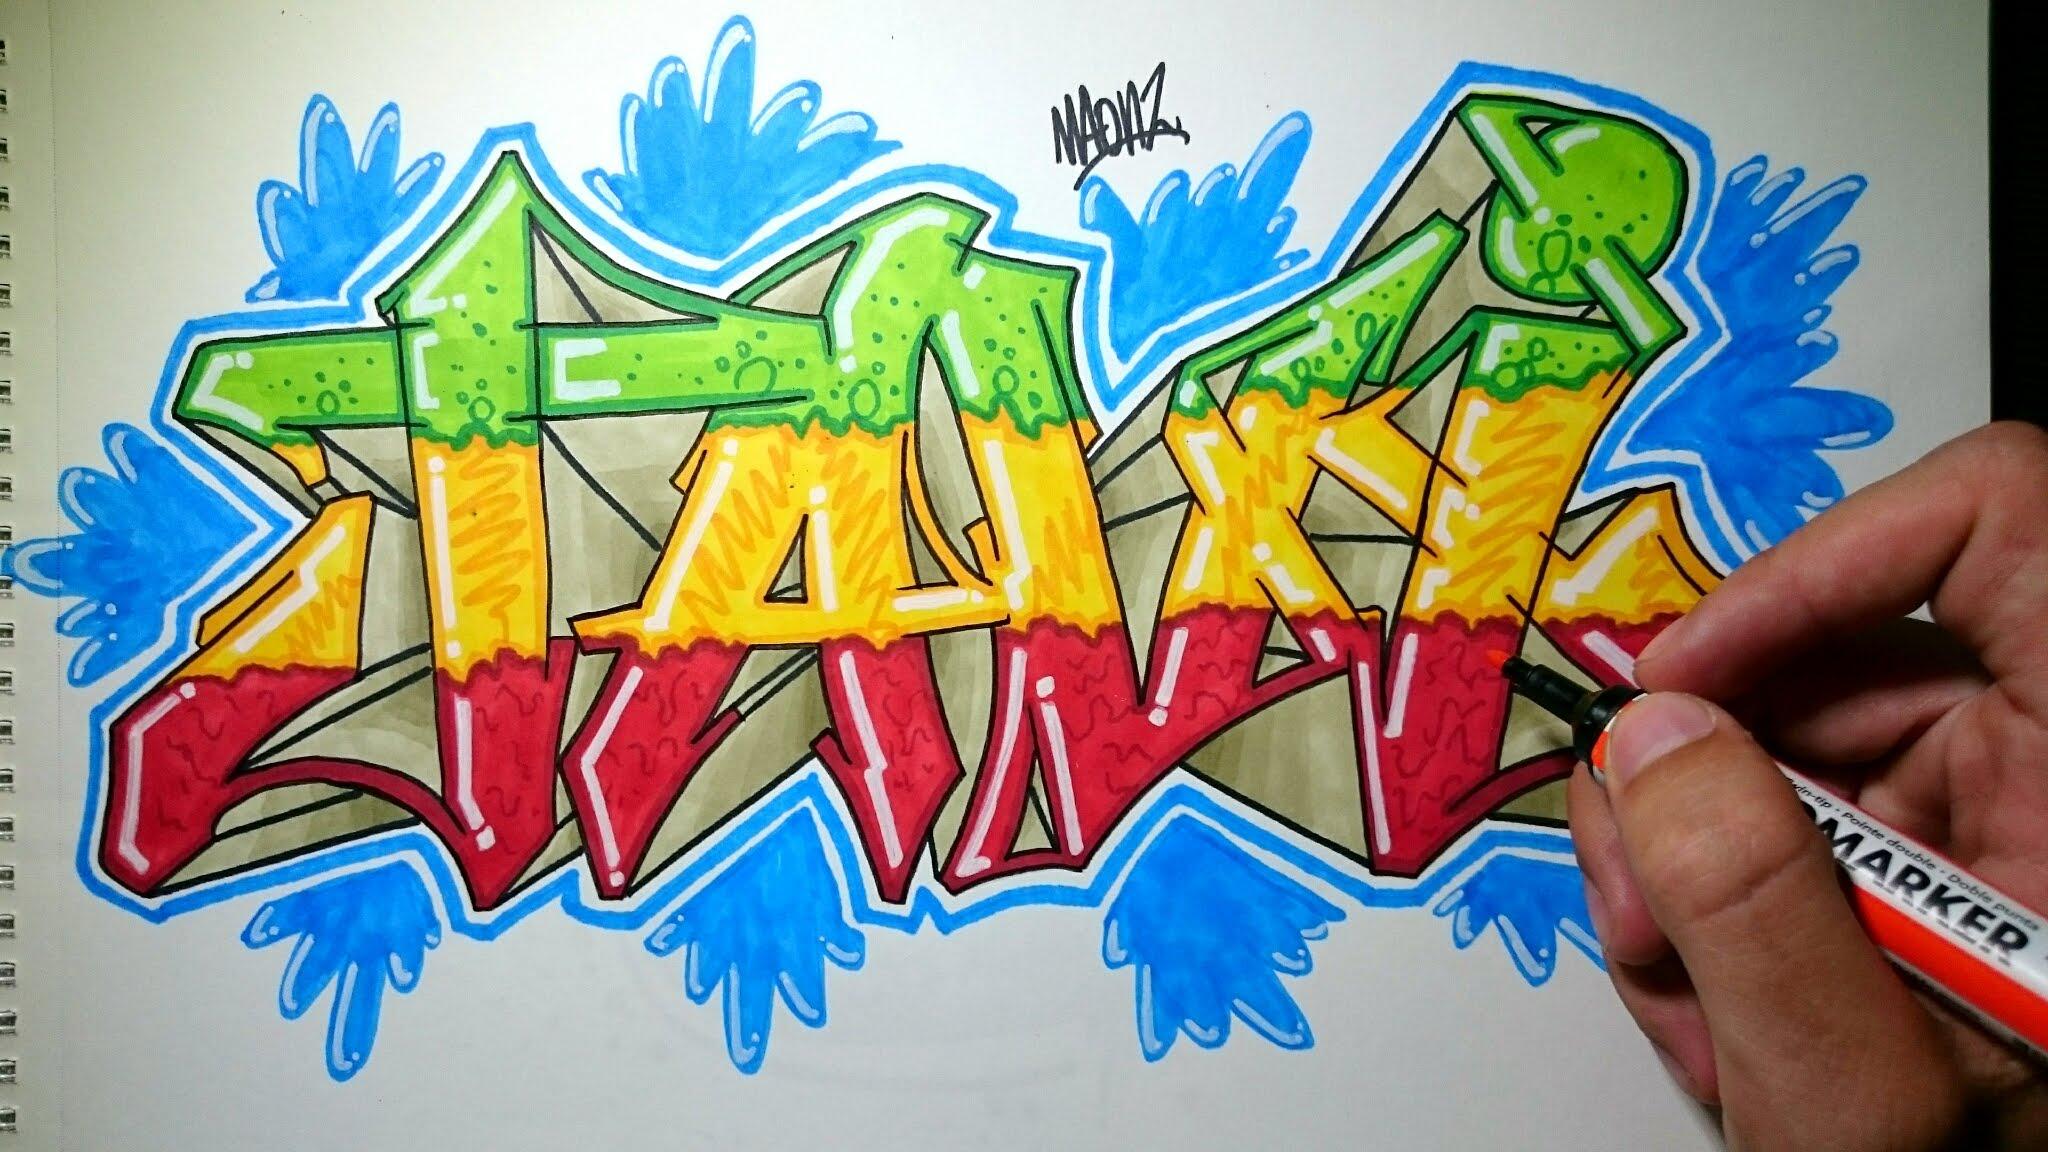 maxresdefault (6)